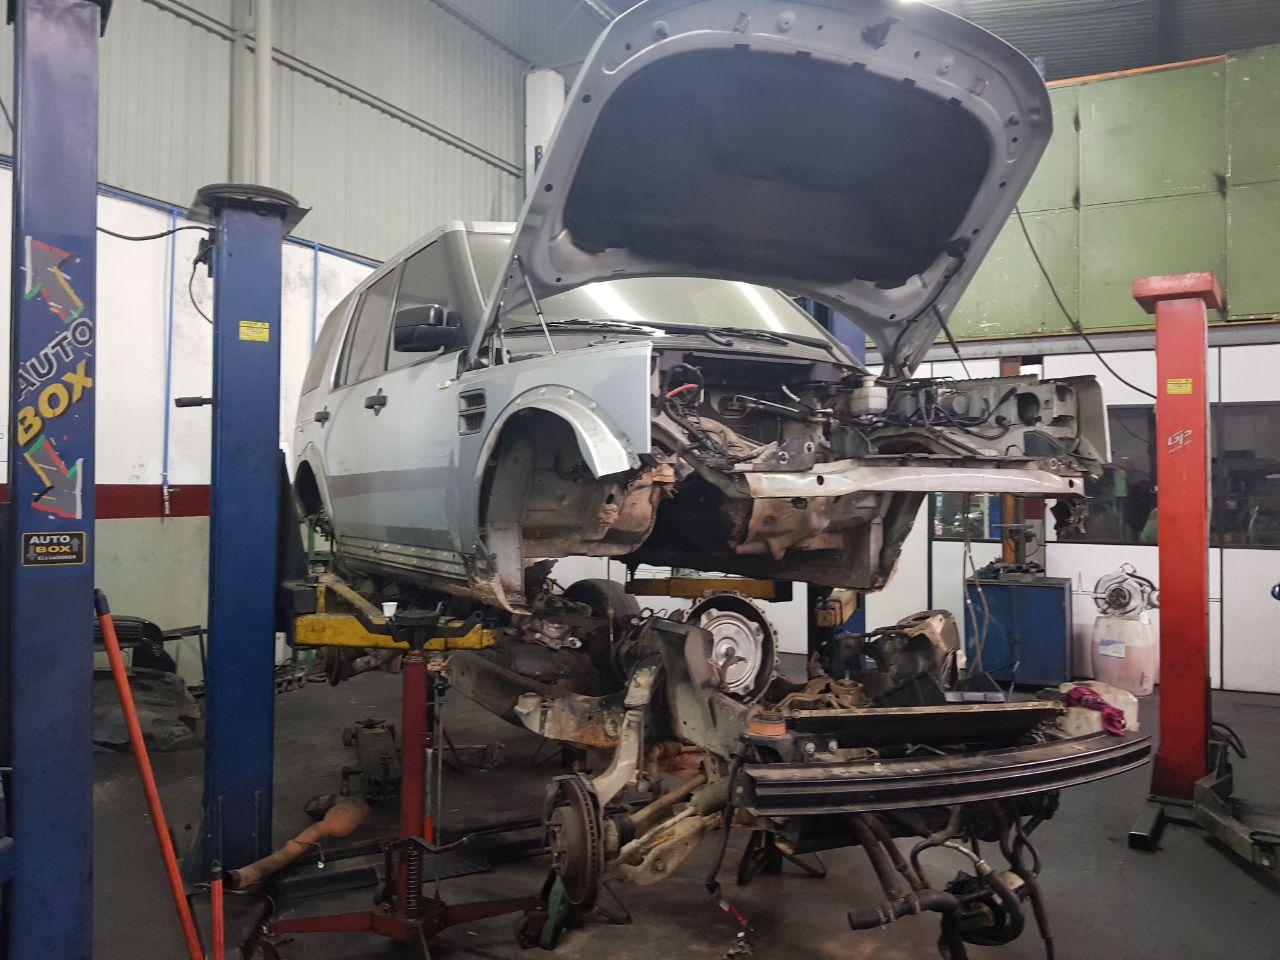 oficina land rover - Troca de óleo e Filtro HR L200 SPRINTER PAJERO MASTER HILUX BONGO